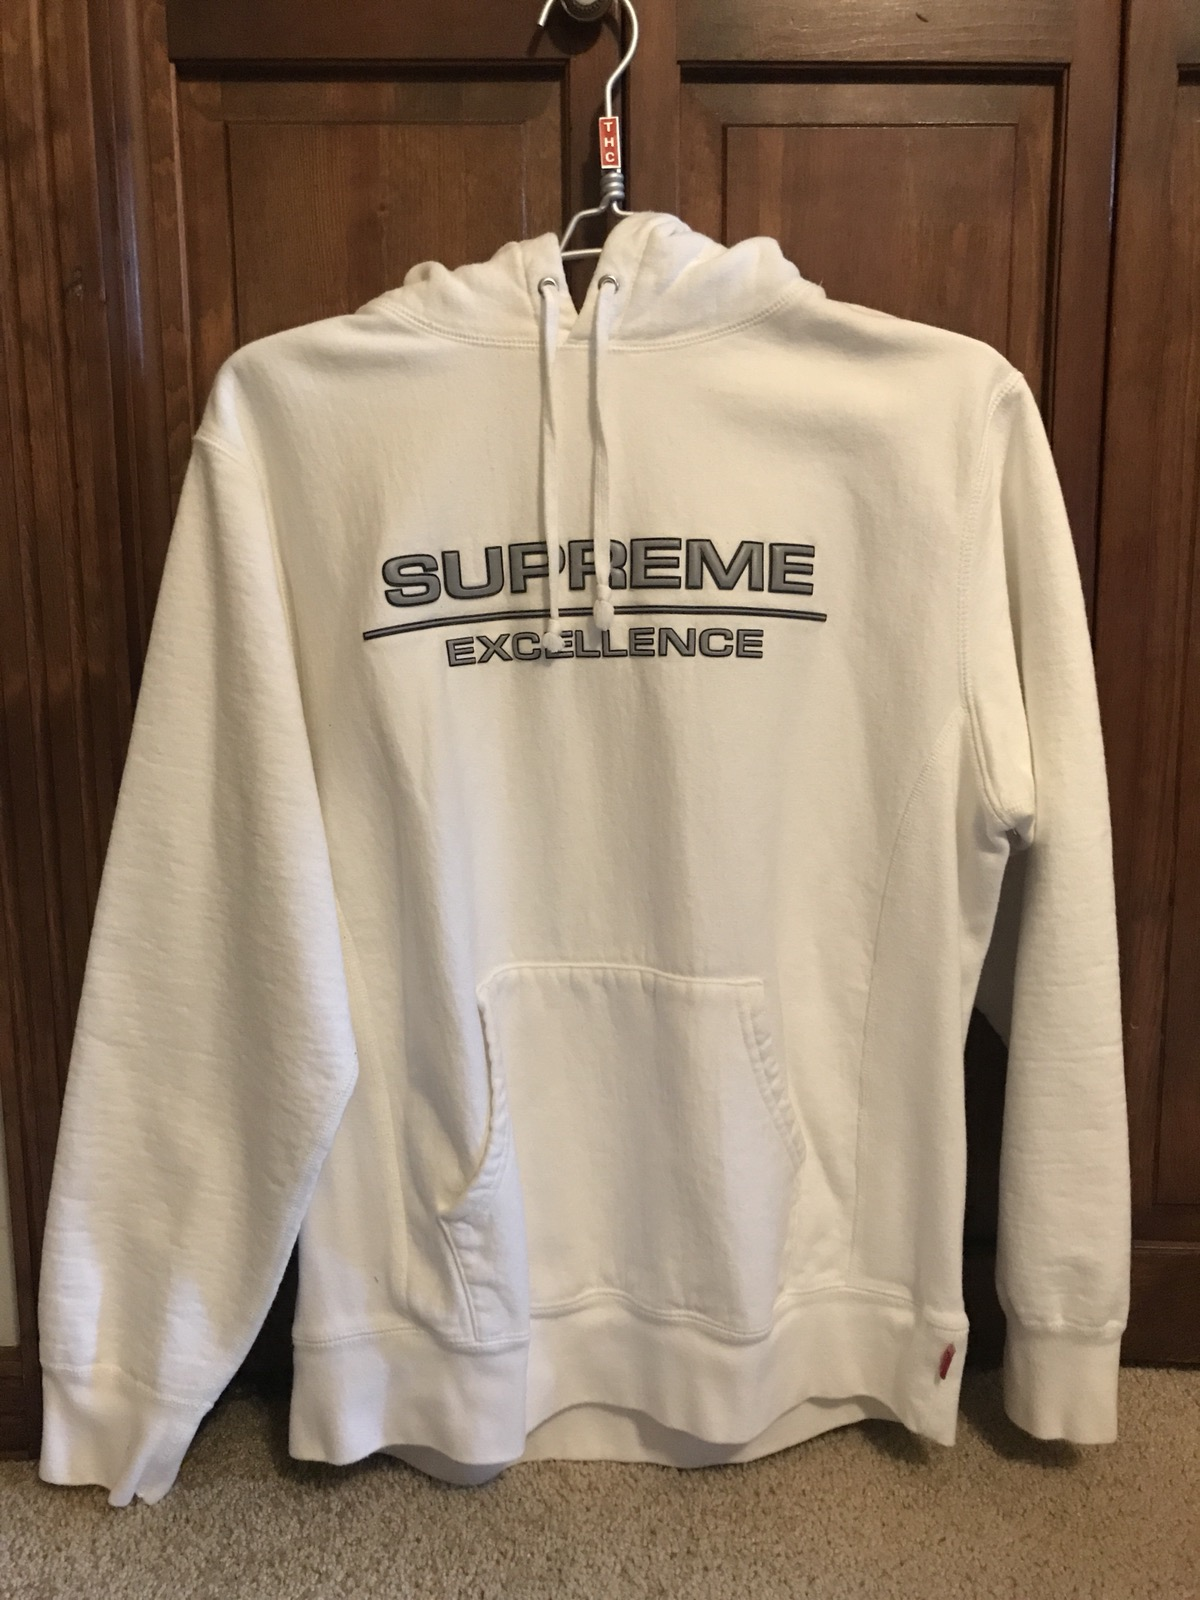 Supreme Supreme Reflective Excellence Hoodie White [ 1600 x 1200 Pixel ]